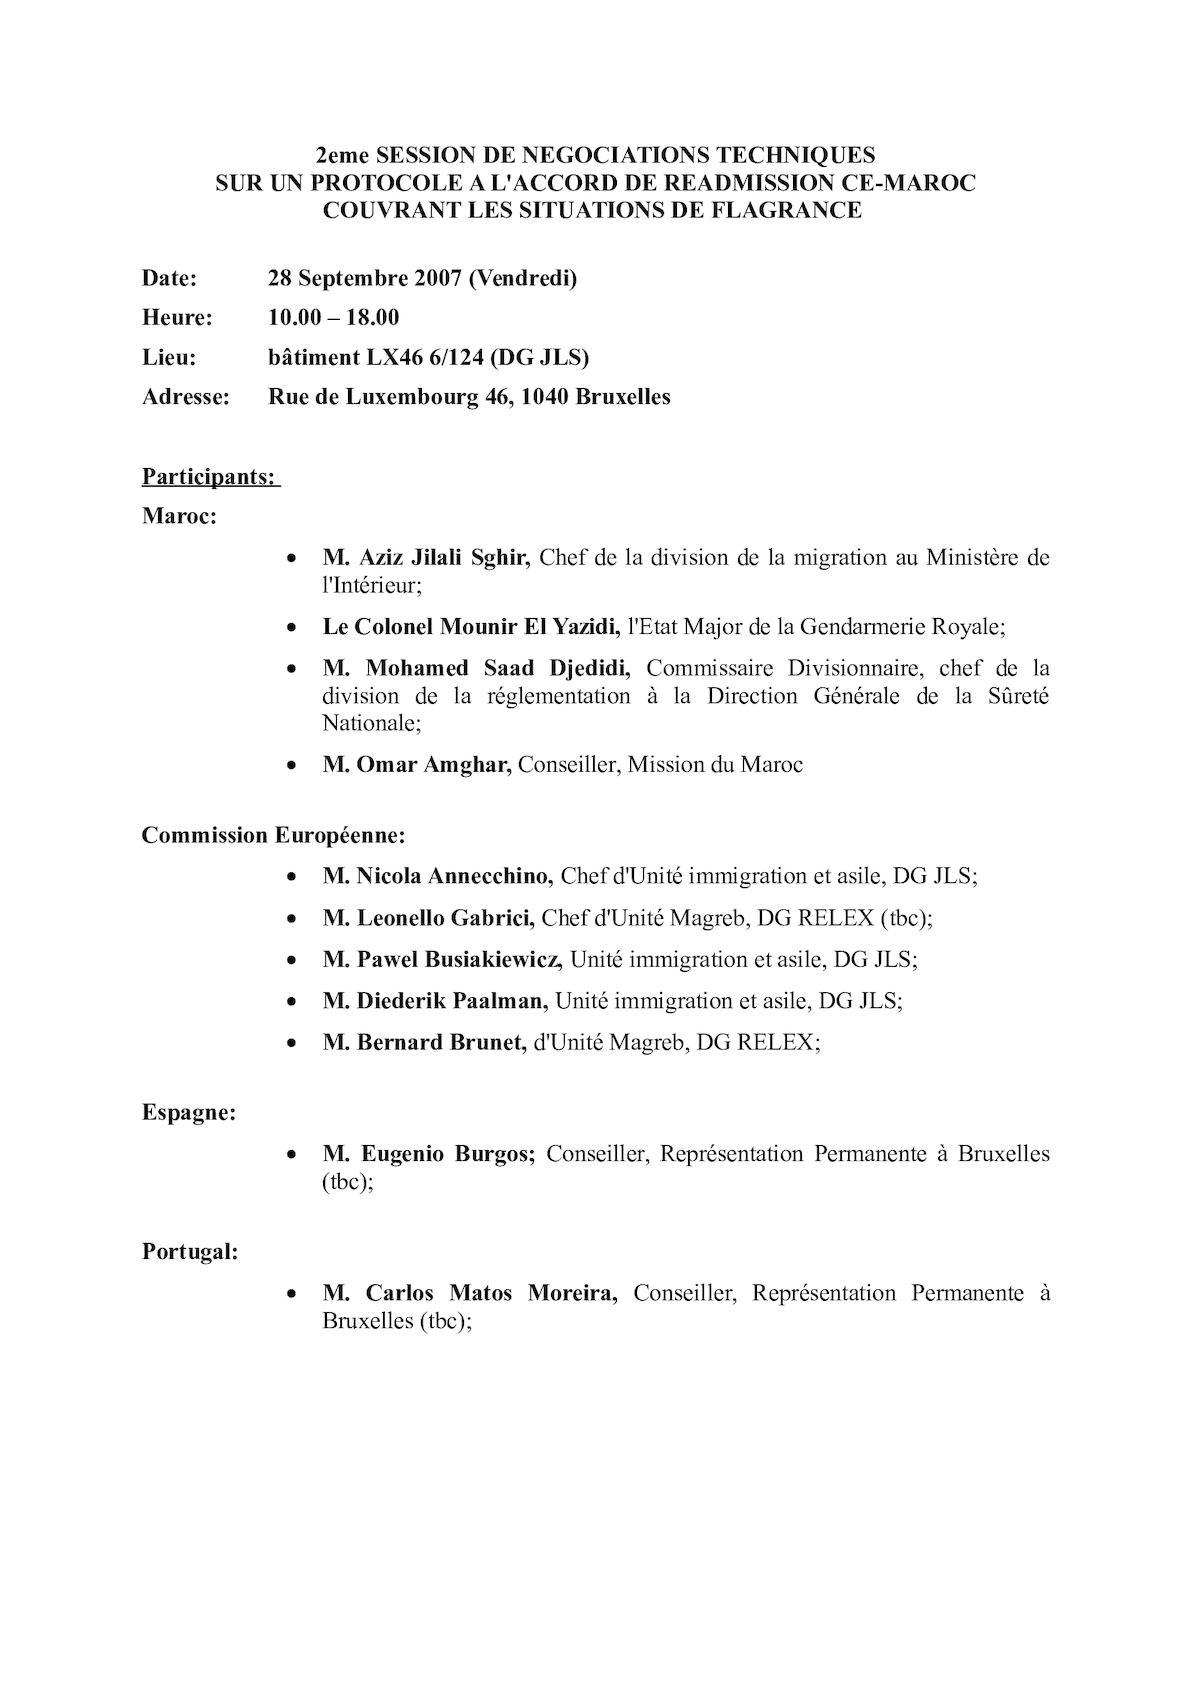 Protocol - Participants 2nd Session